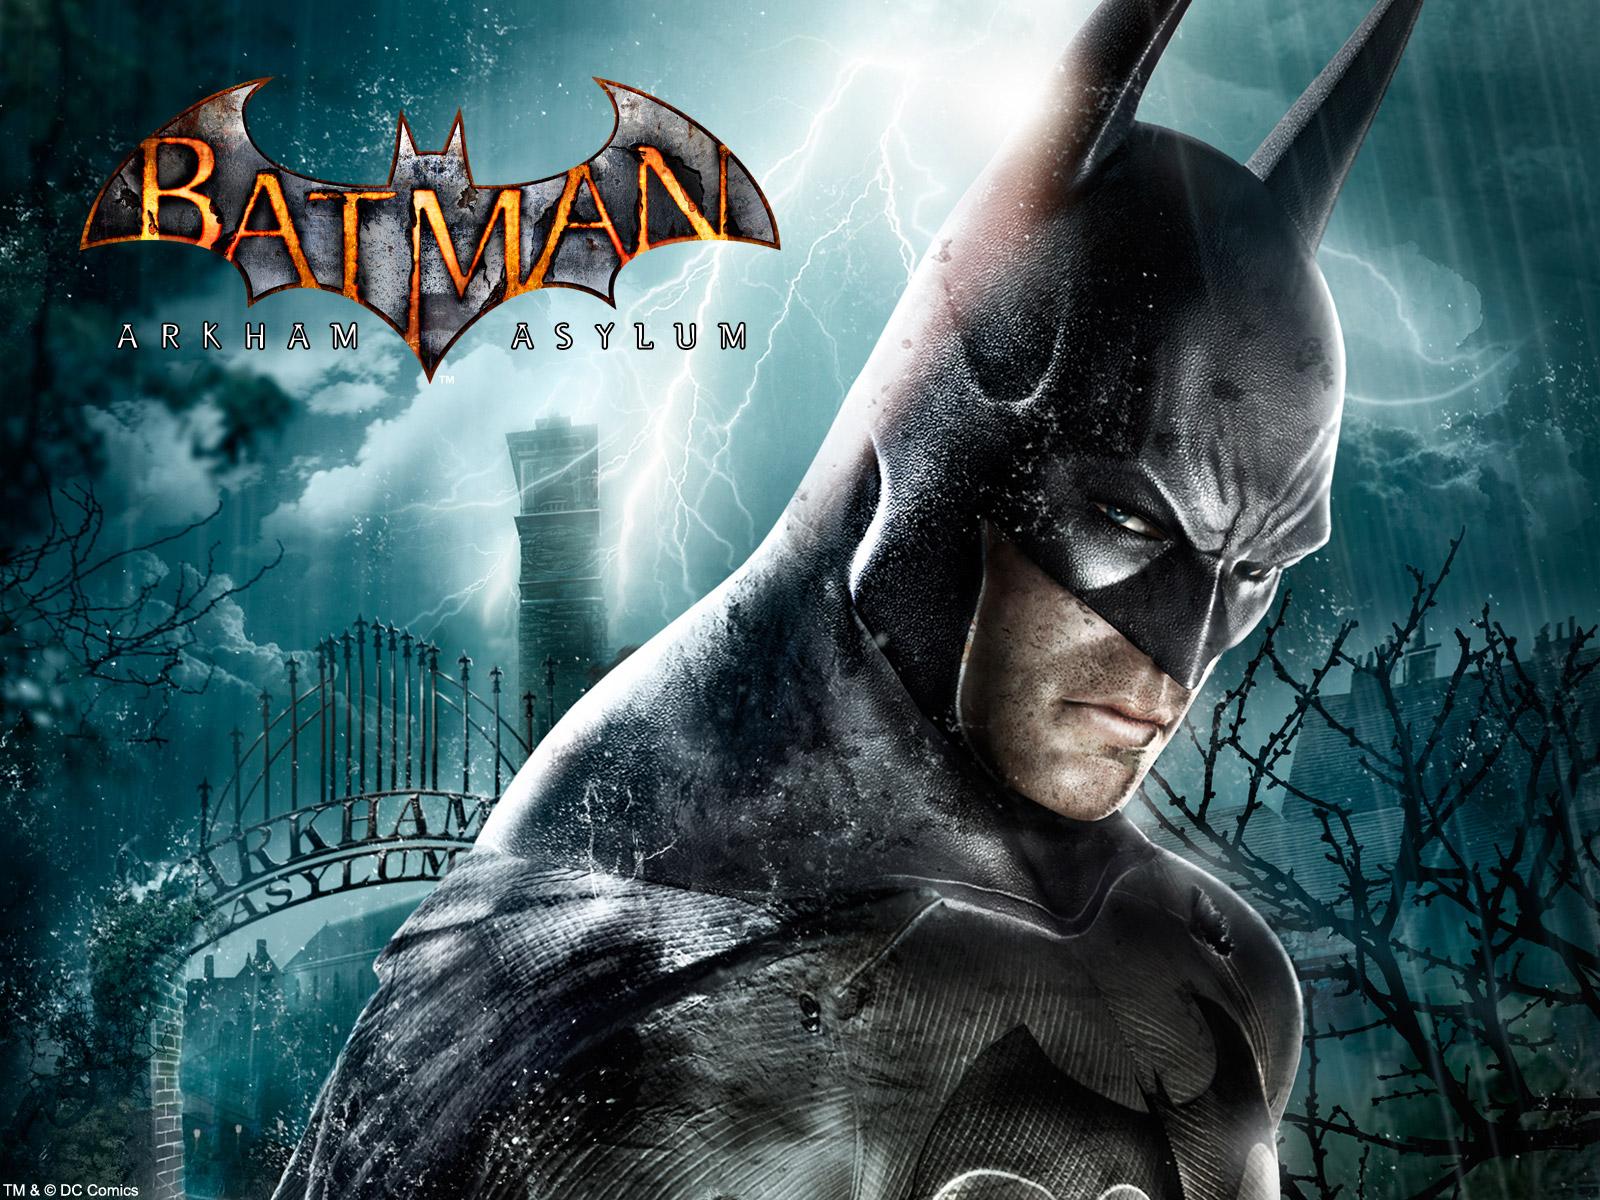 Batman Arkham Asylum Wallpapers HD Wallpapers 1600x1200